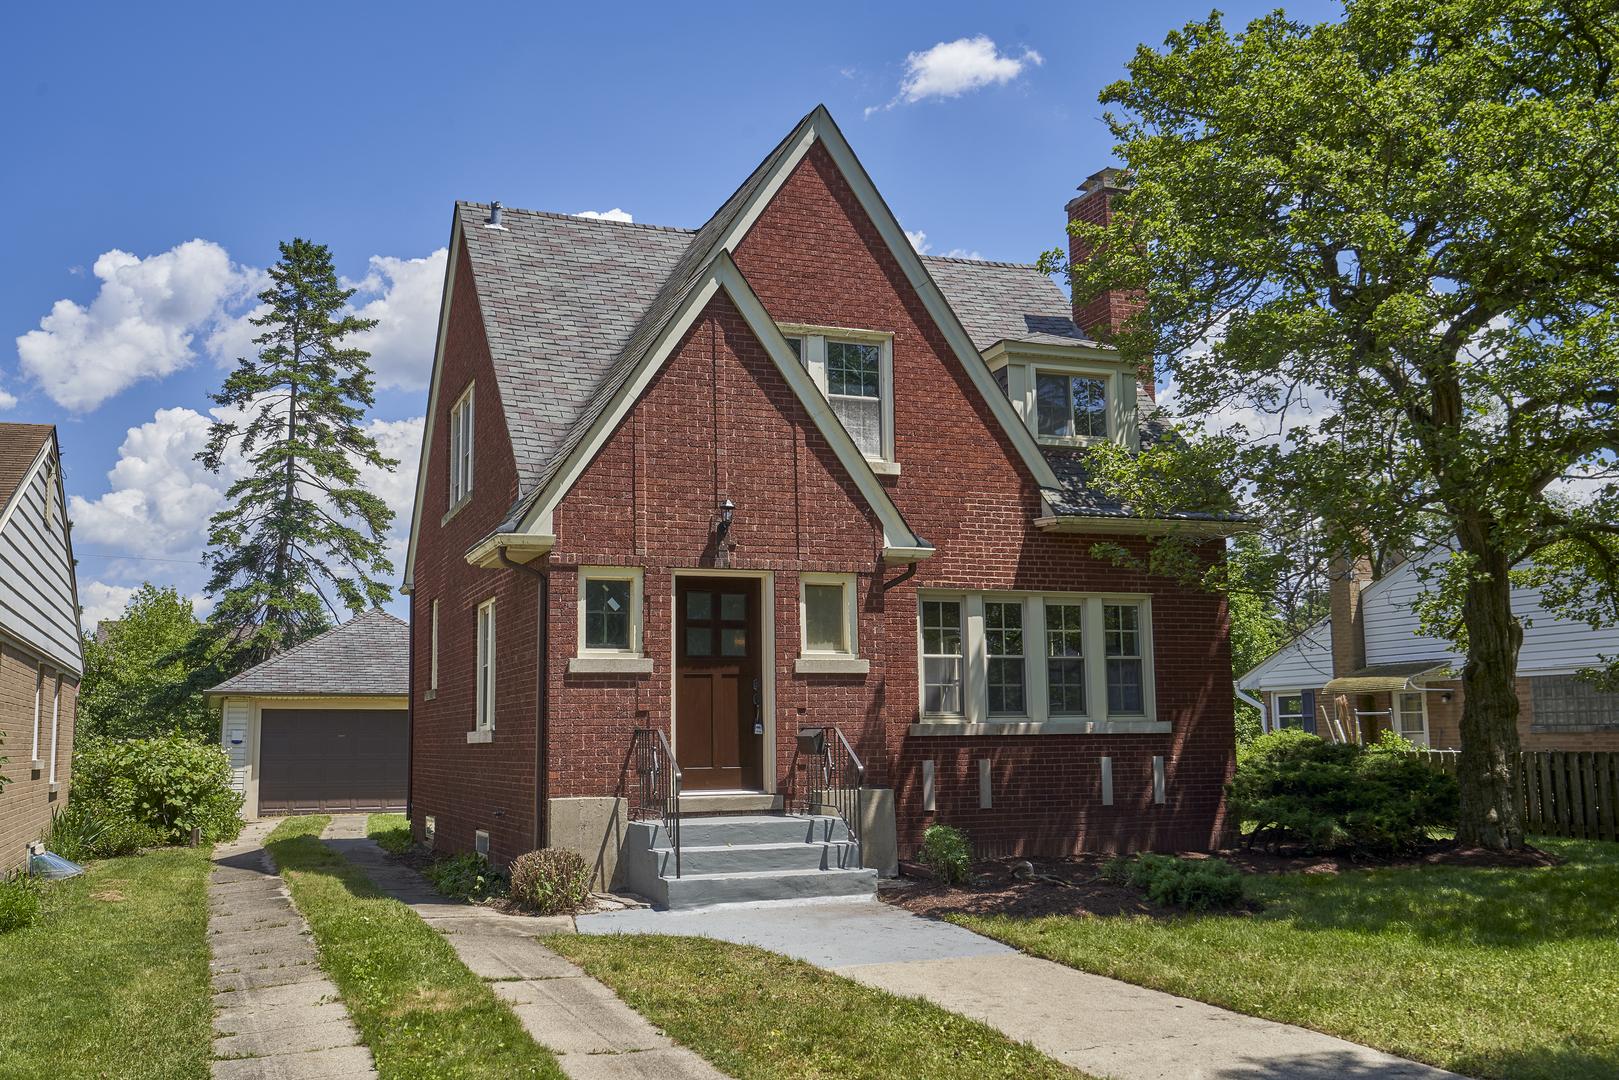 105 N Lancaster Street, Mount Prospect IL 60056